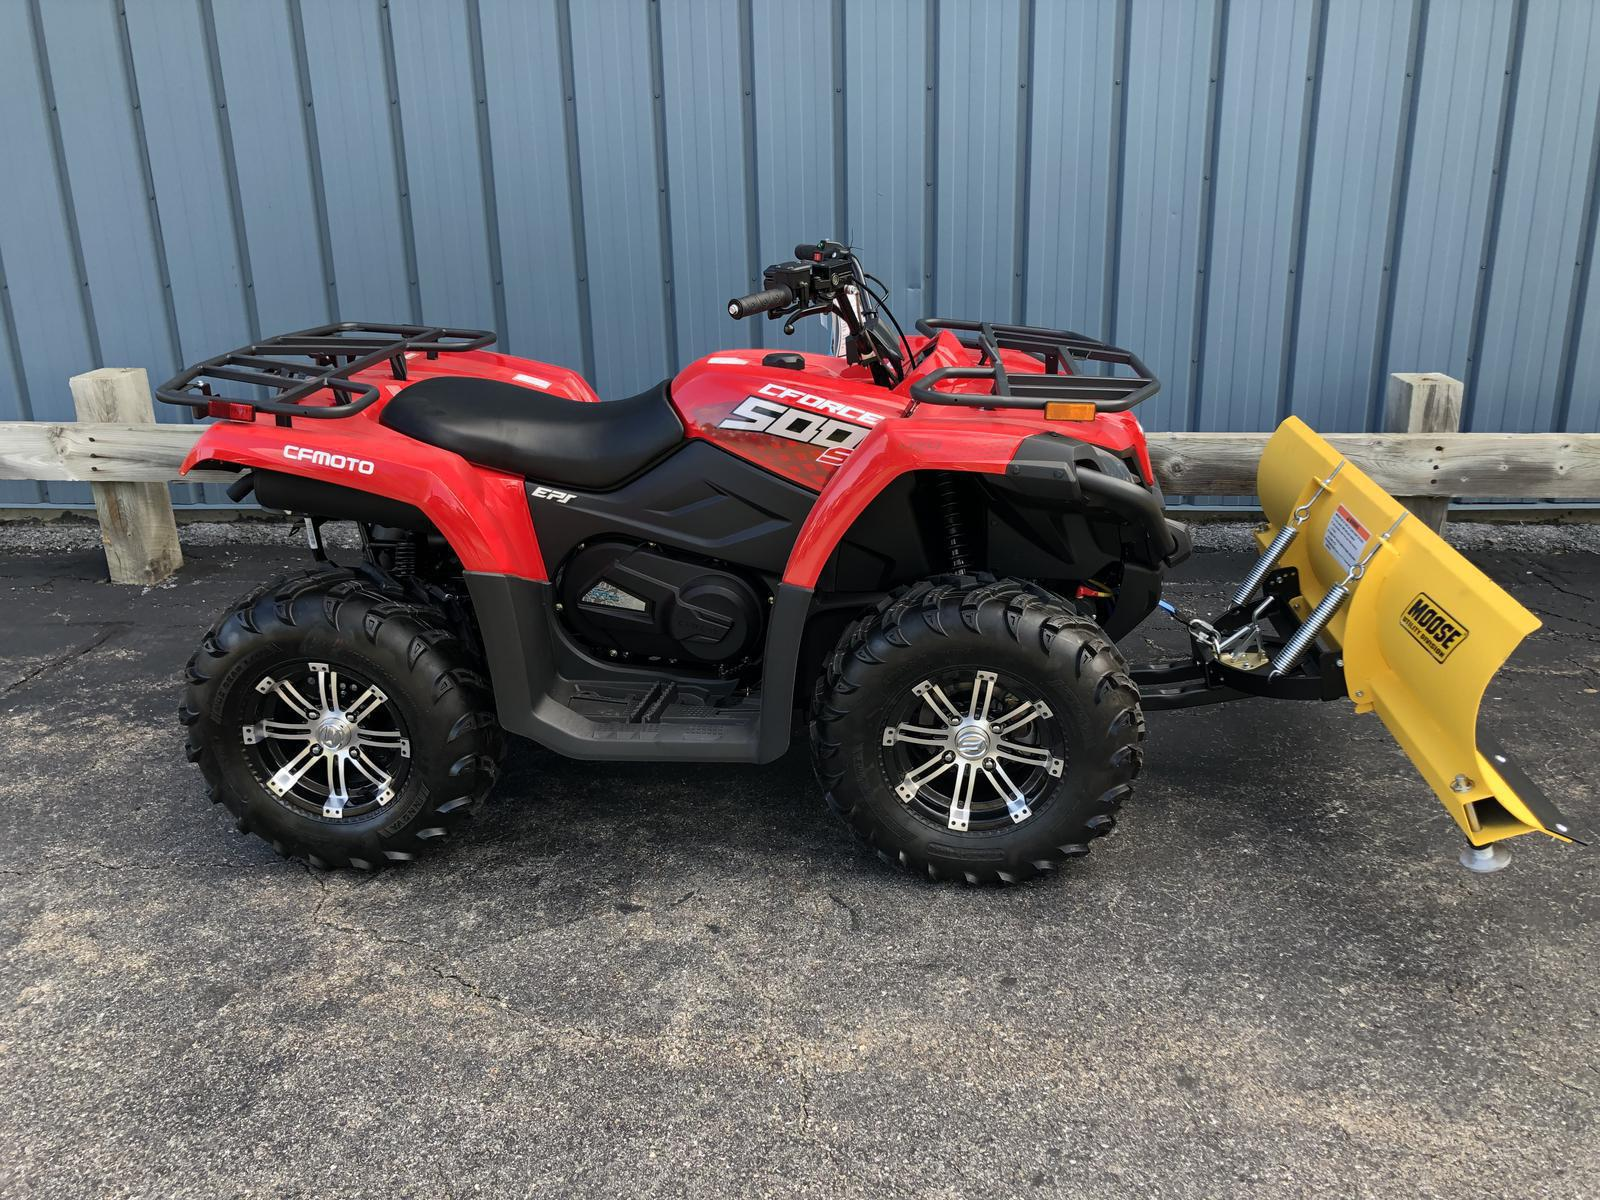 Inventory from CFMOTO Roadside Motorsports Williston, VT